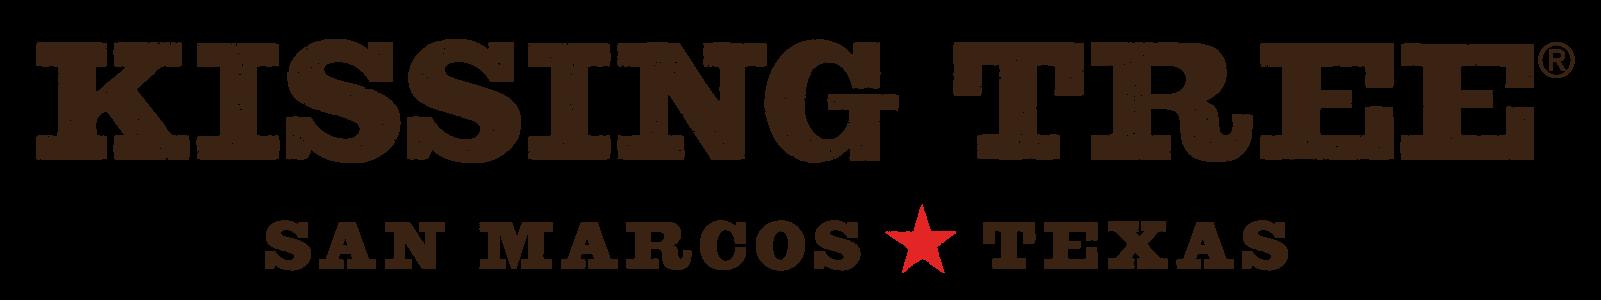 Kissing-Tree-logo.png